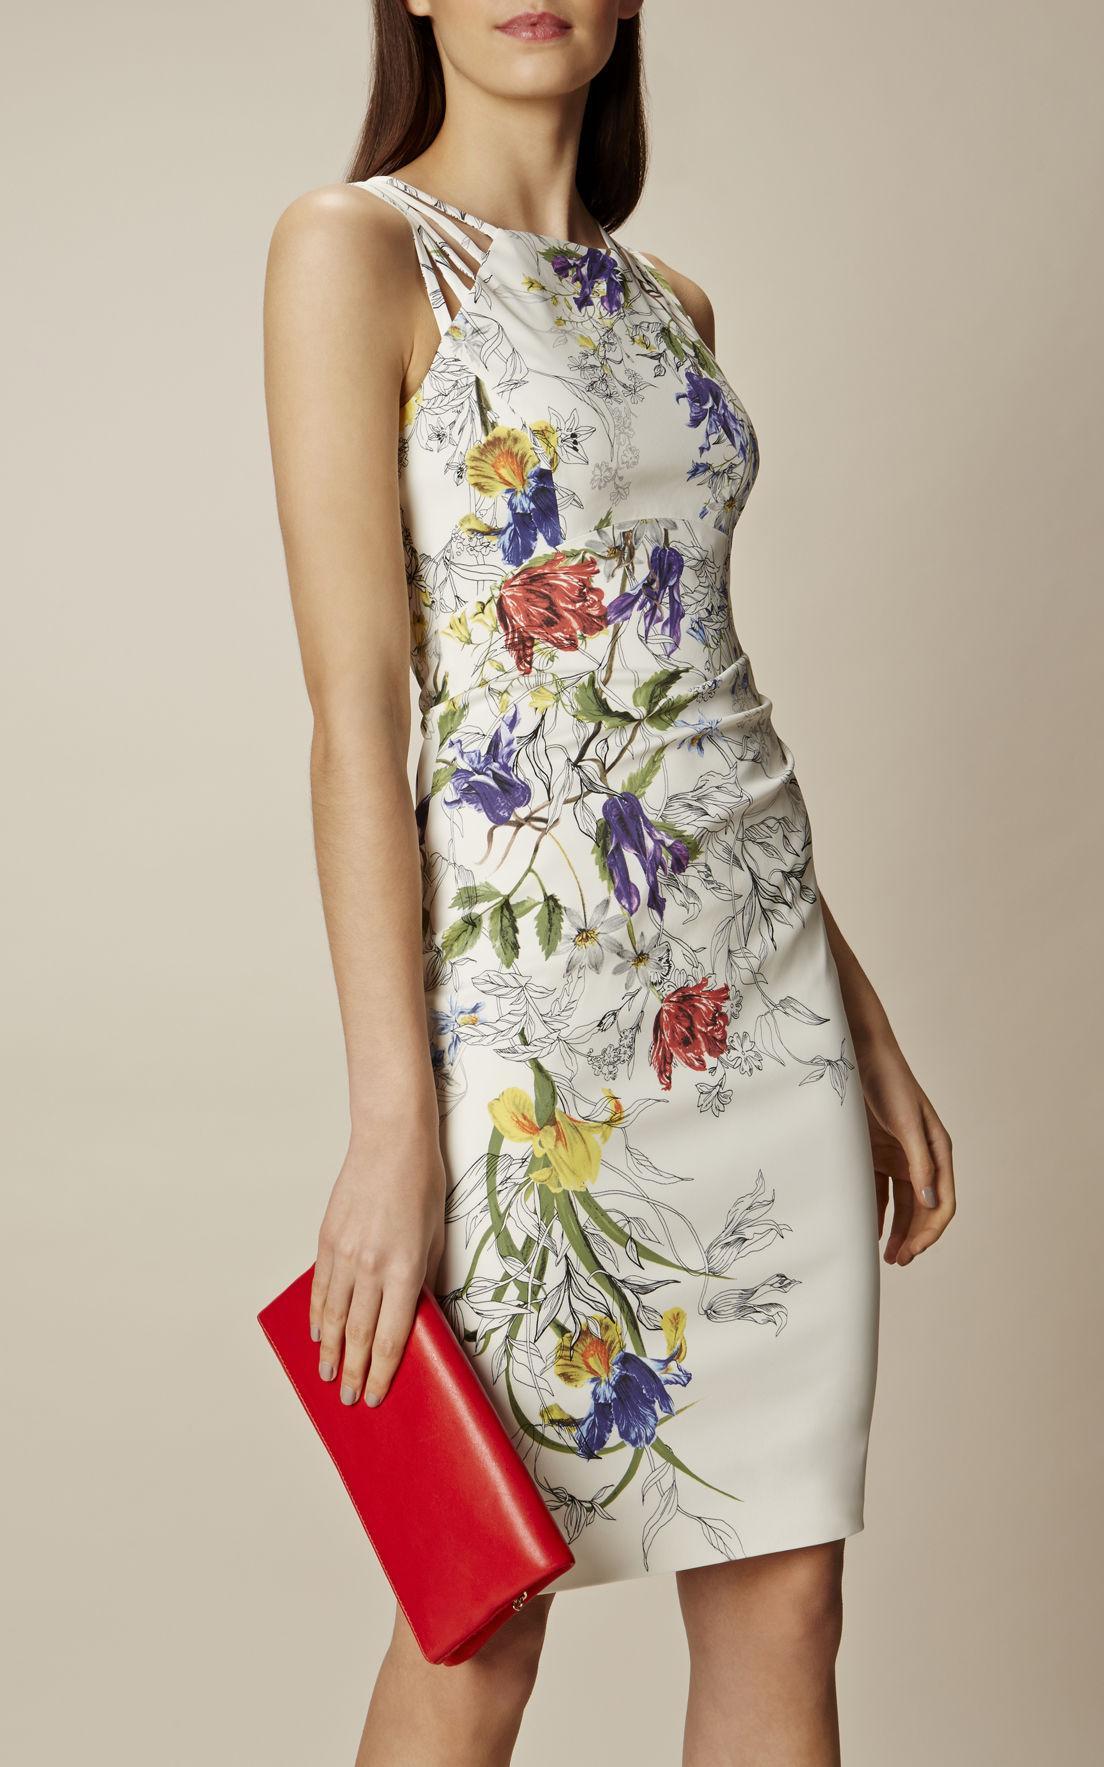 Lyst Karen Millen White Amp Floral Pencil Dress